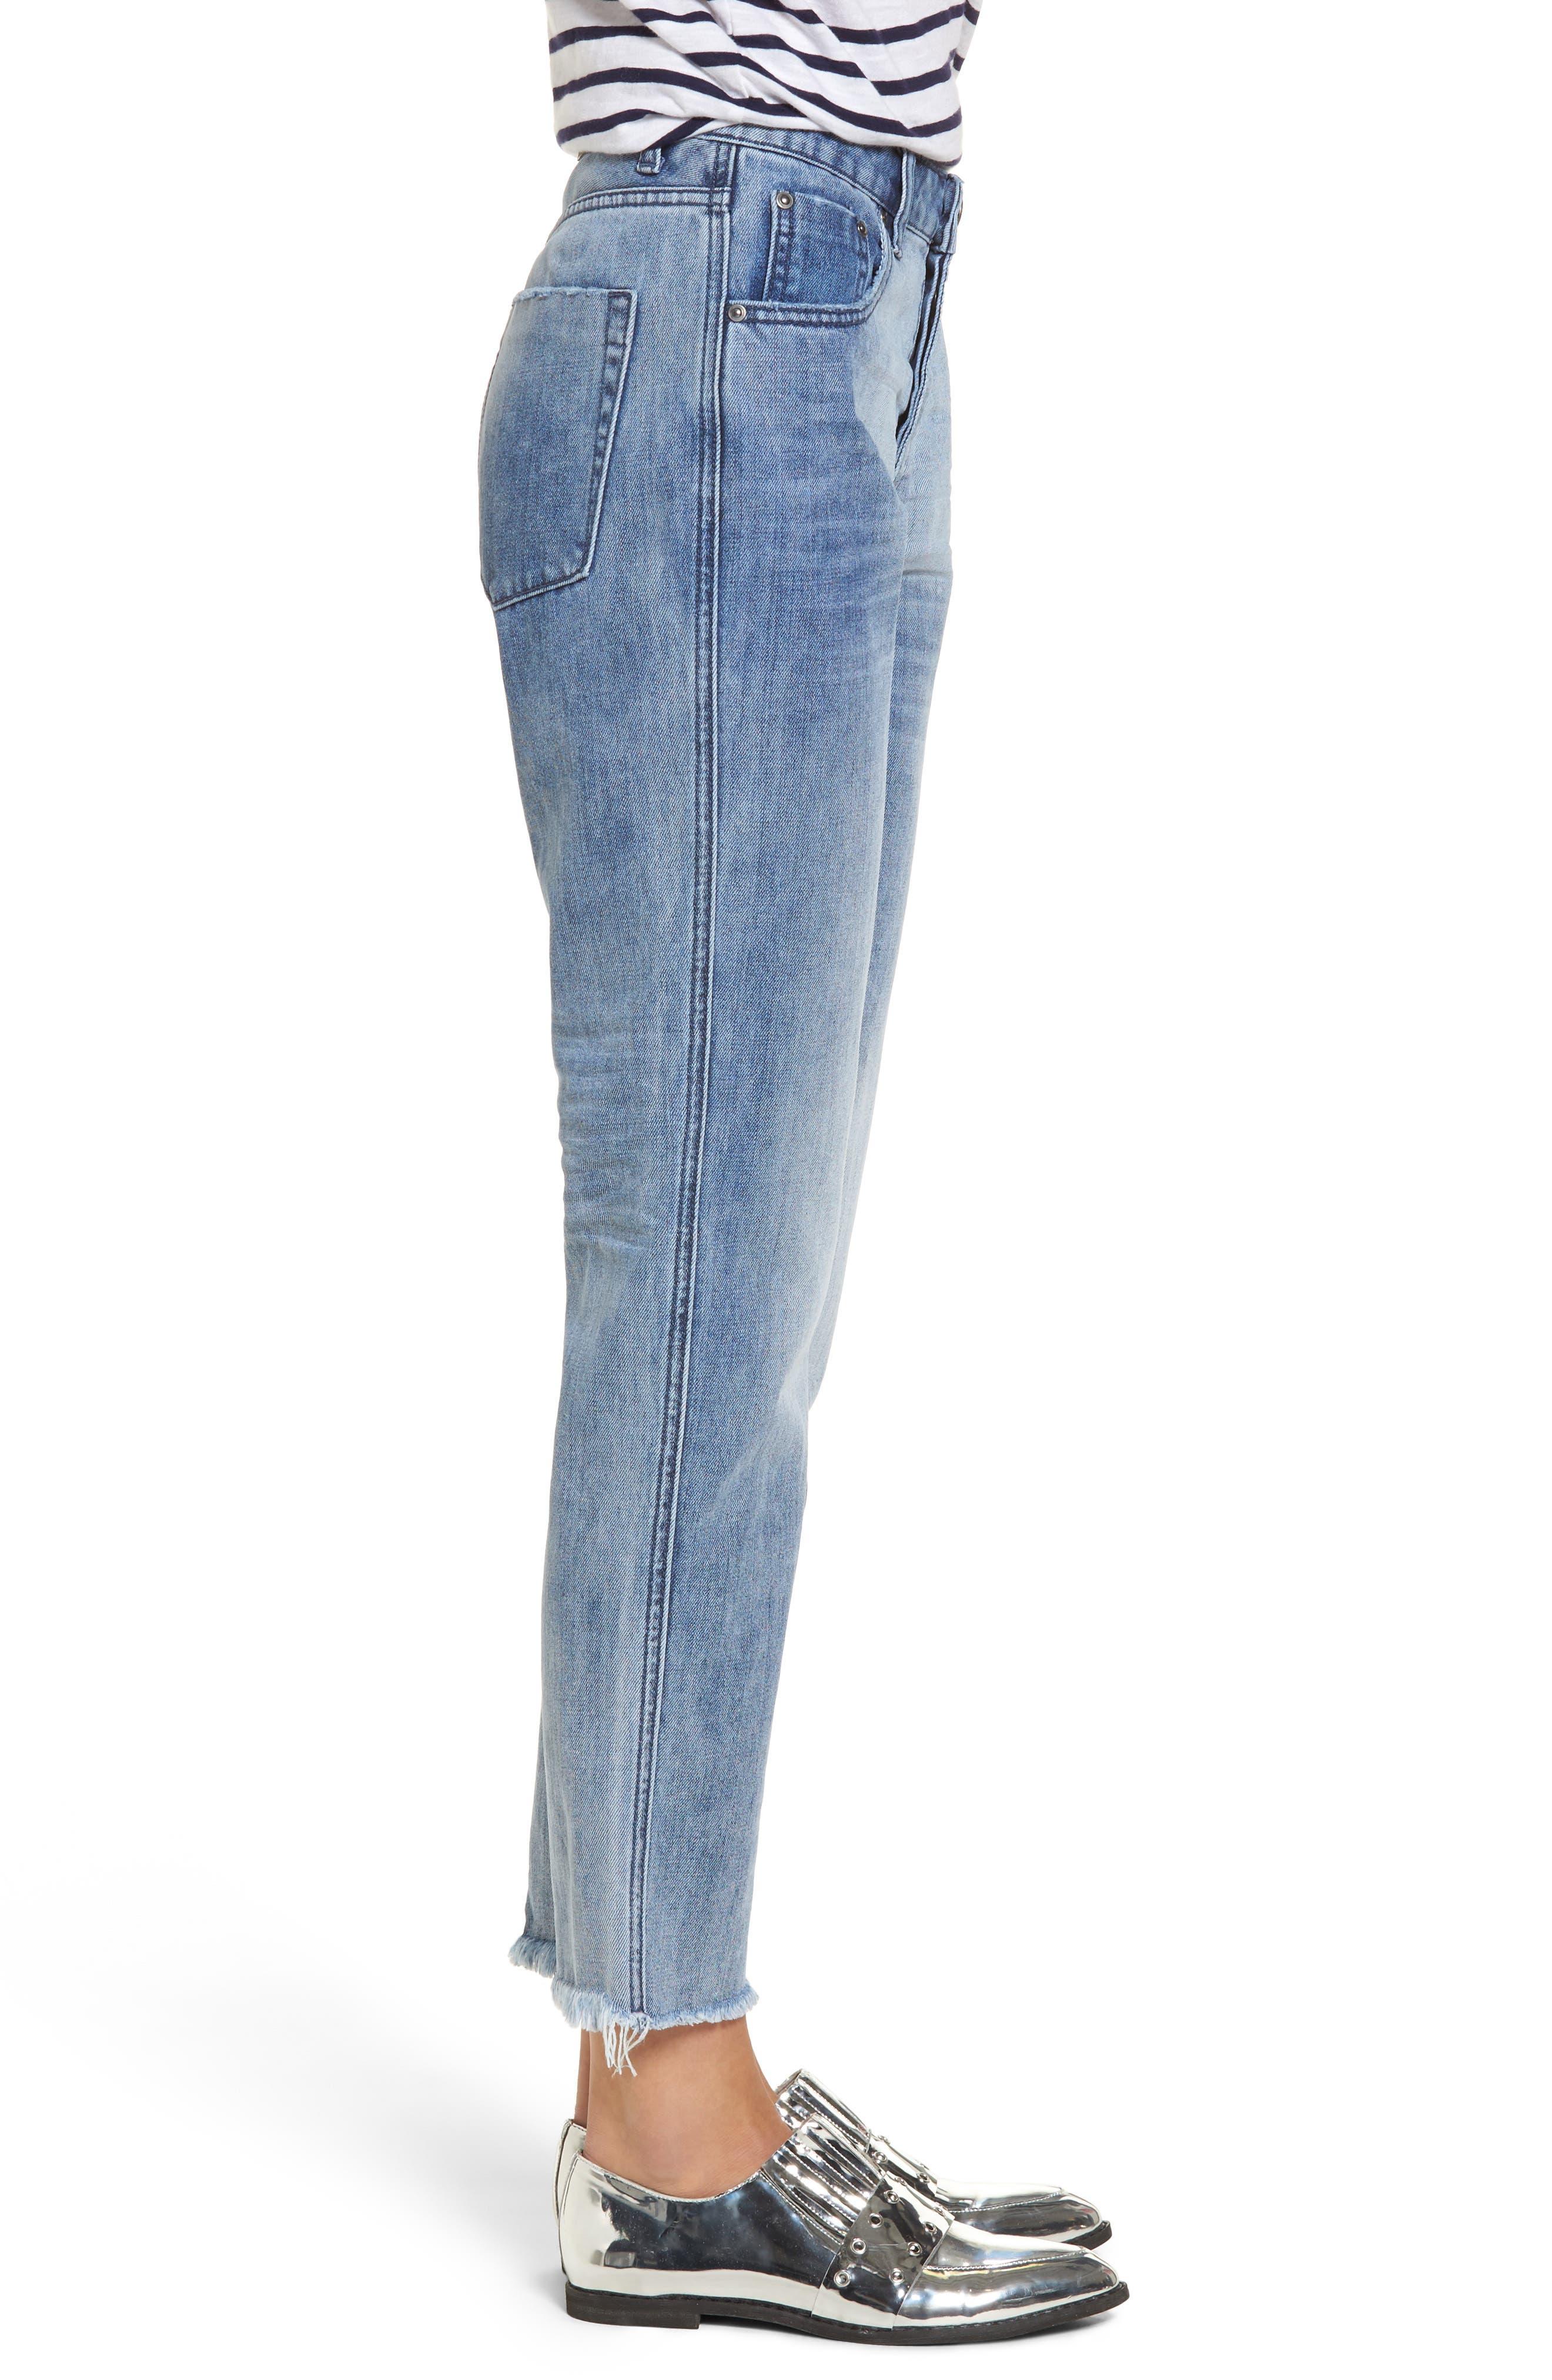 Tuckers High Waist Straight Leg Jeans,                             Alternate thumbnail 3, color,                             456